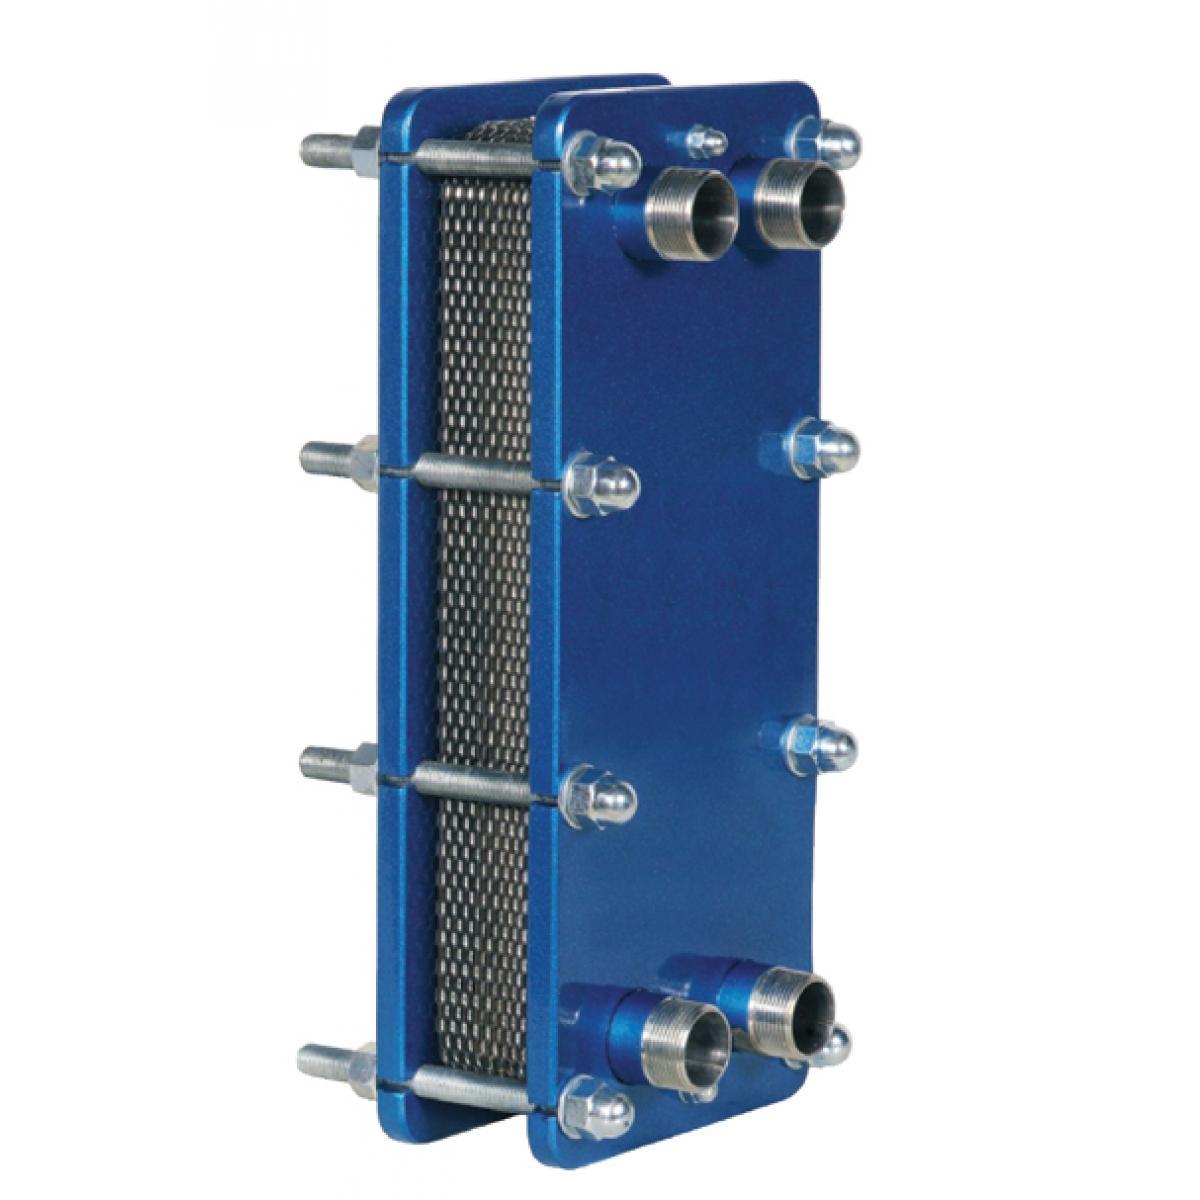 Hydropool LT | Plate heat exchanger BEHNCKE TSC 510 / TSC 910